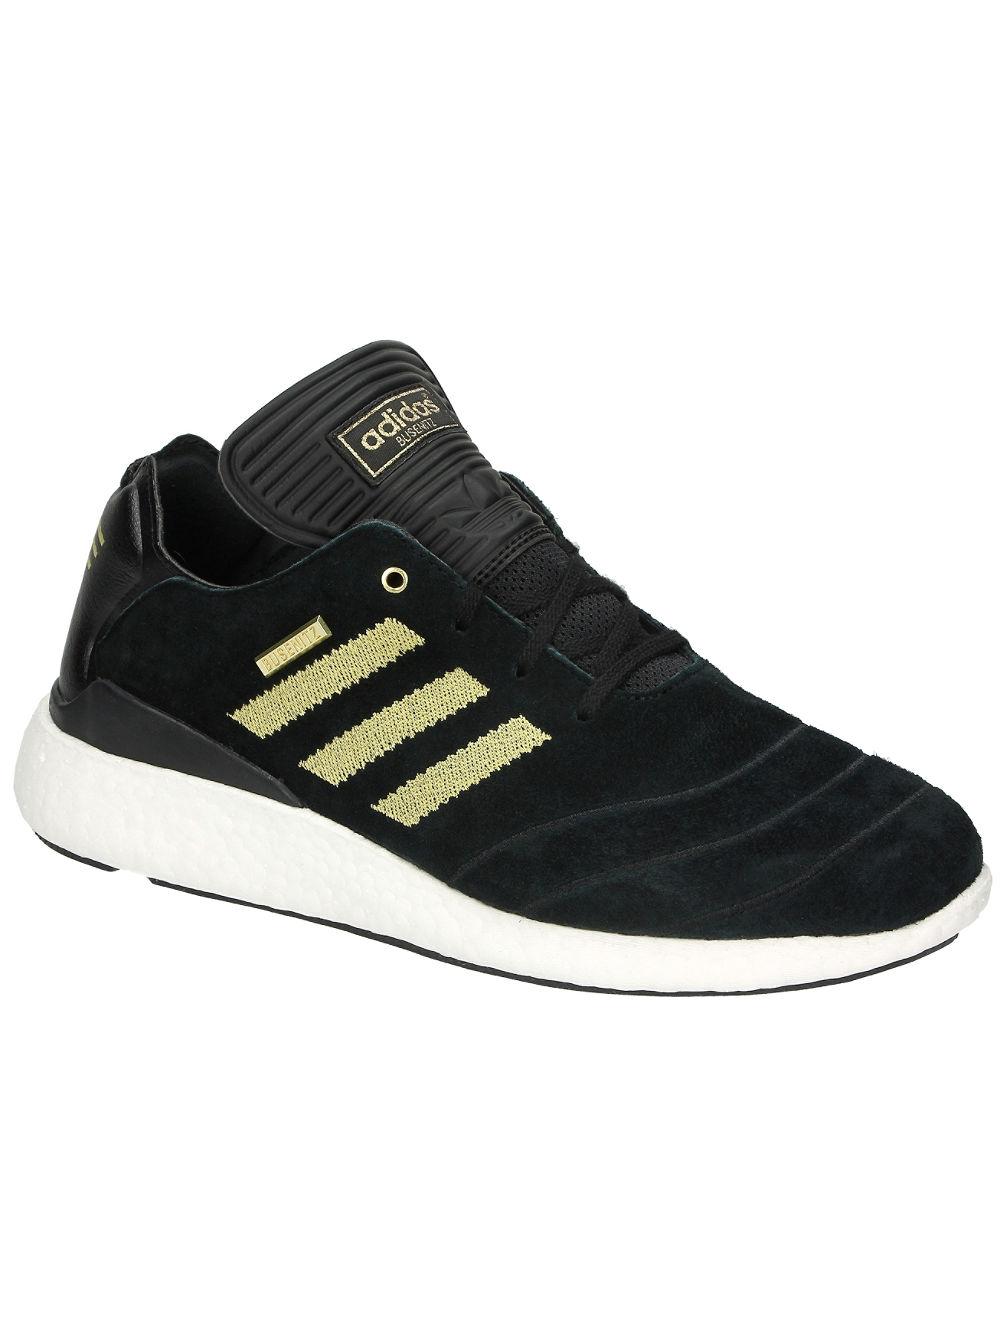 11534deded5e9 Buy adidas Skateboarding Busenitz Pure Boost 10 YR Anni Skate Shoes ...